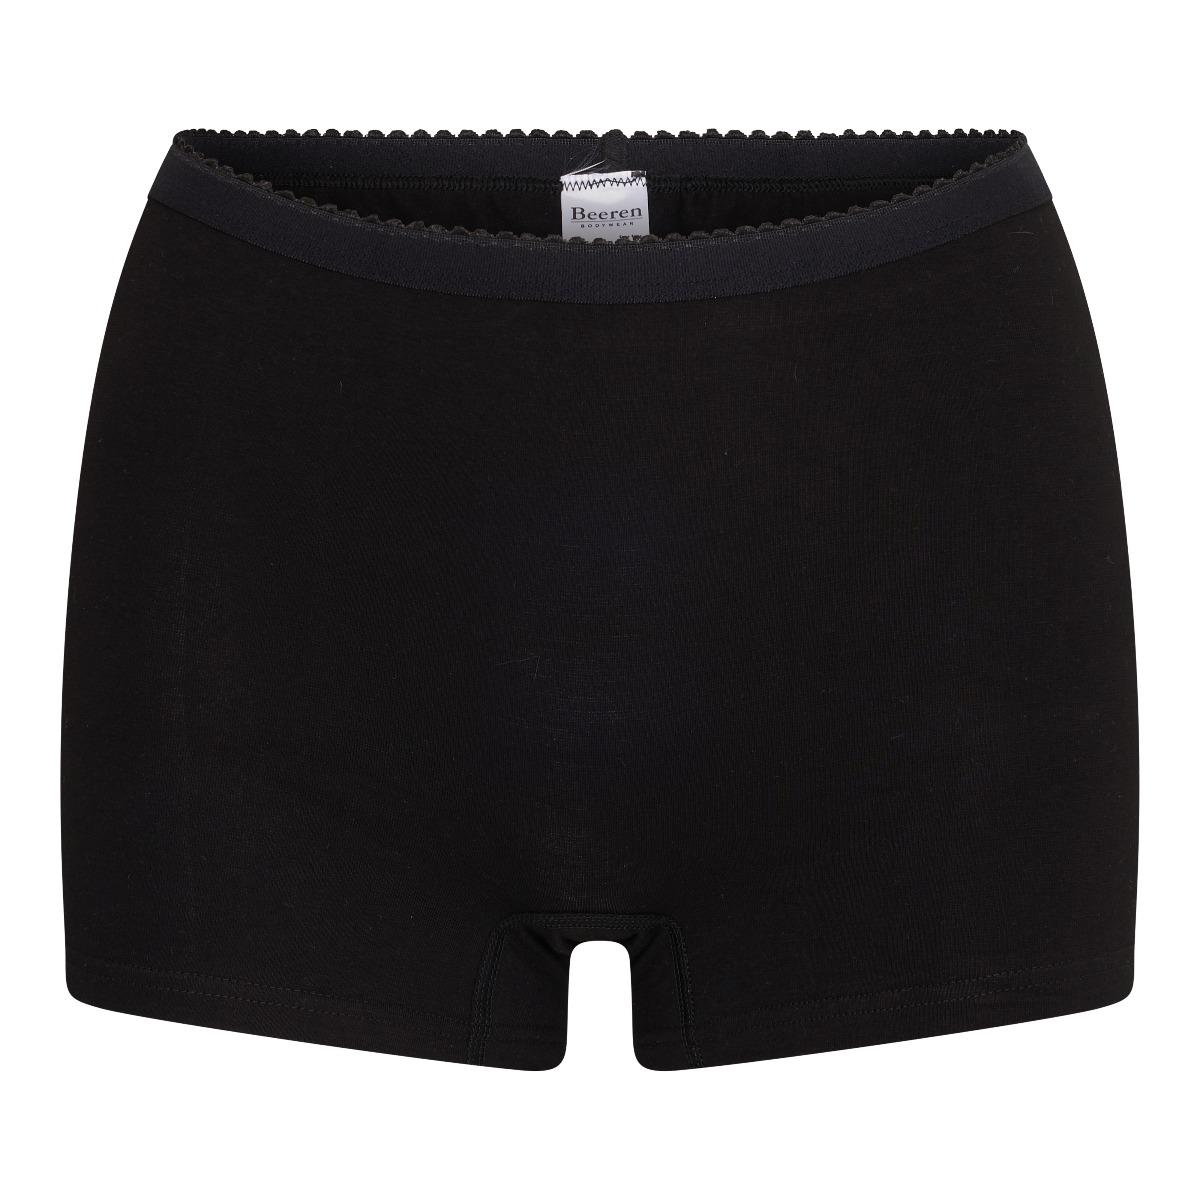 Beeren Softly Dames Panty Zwart XL